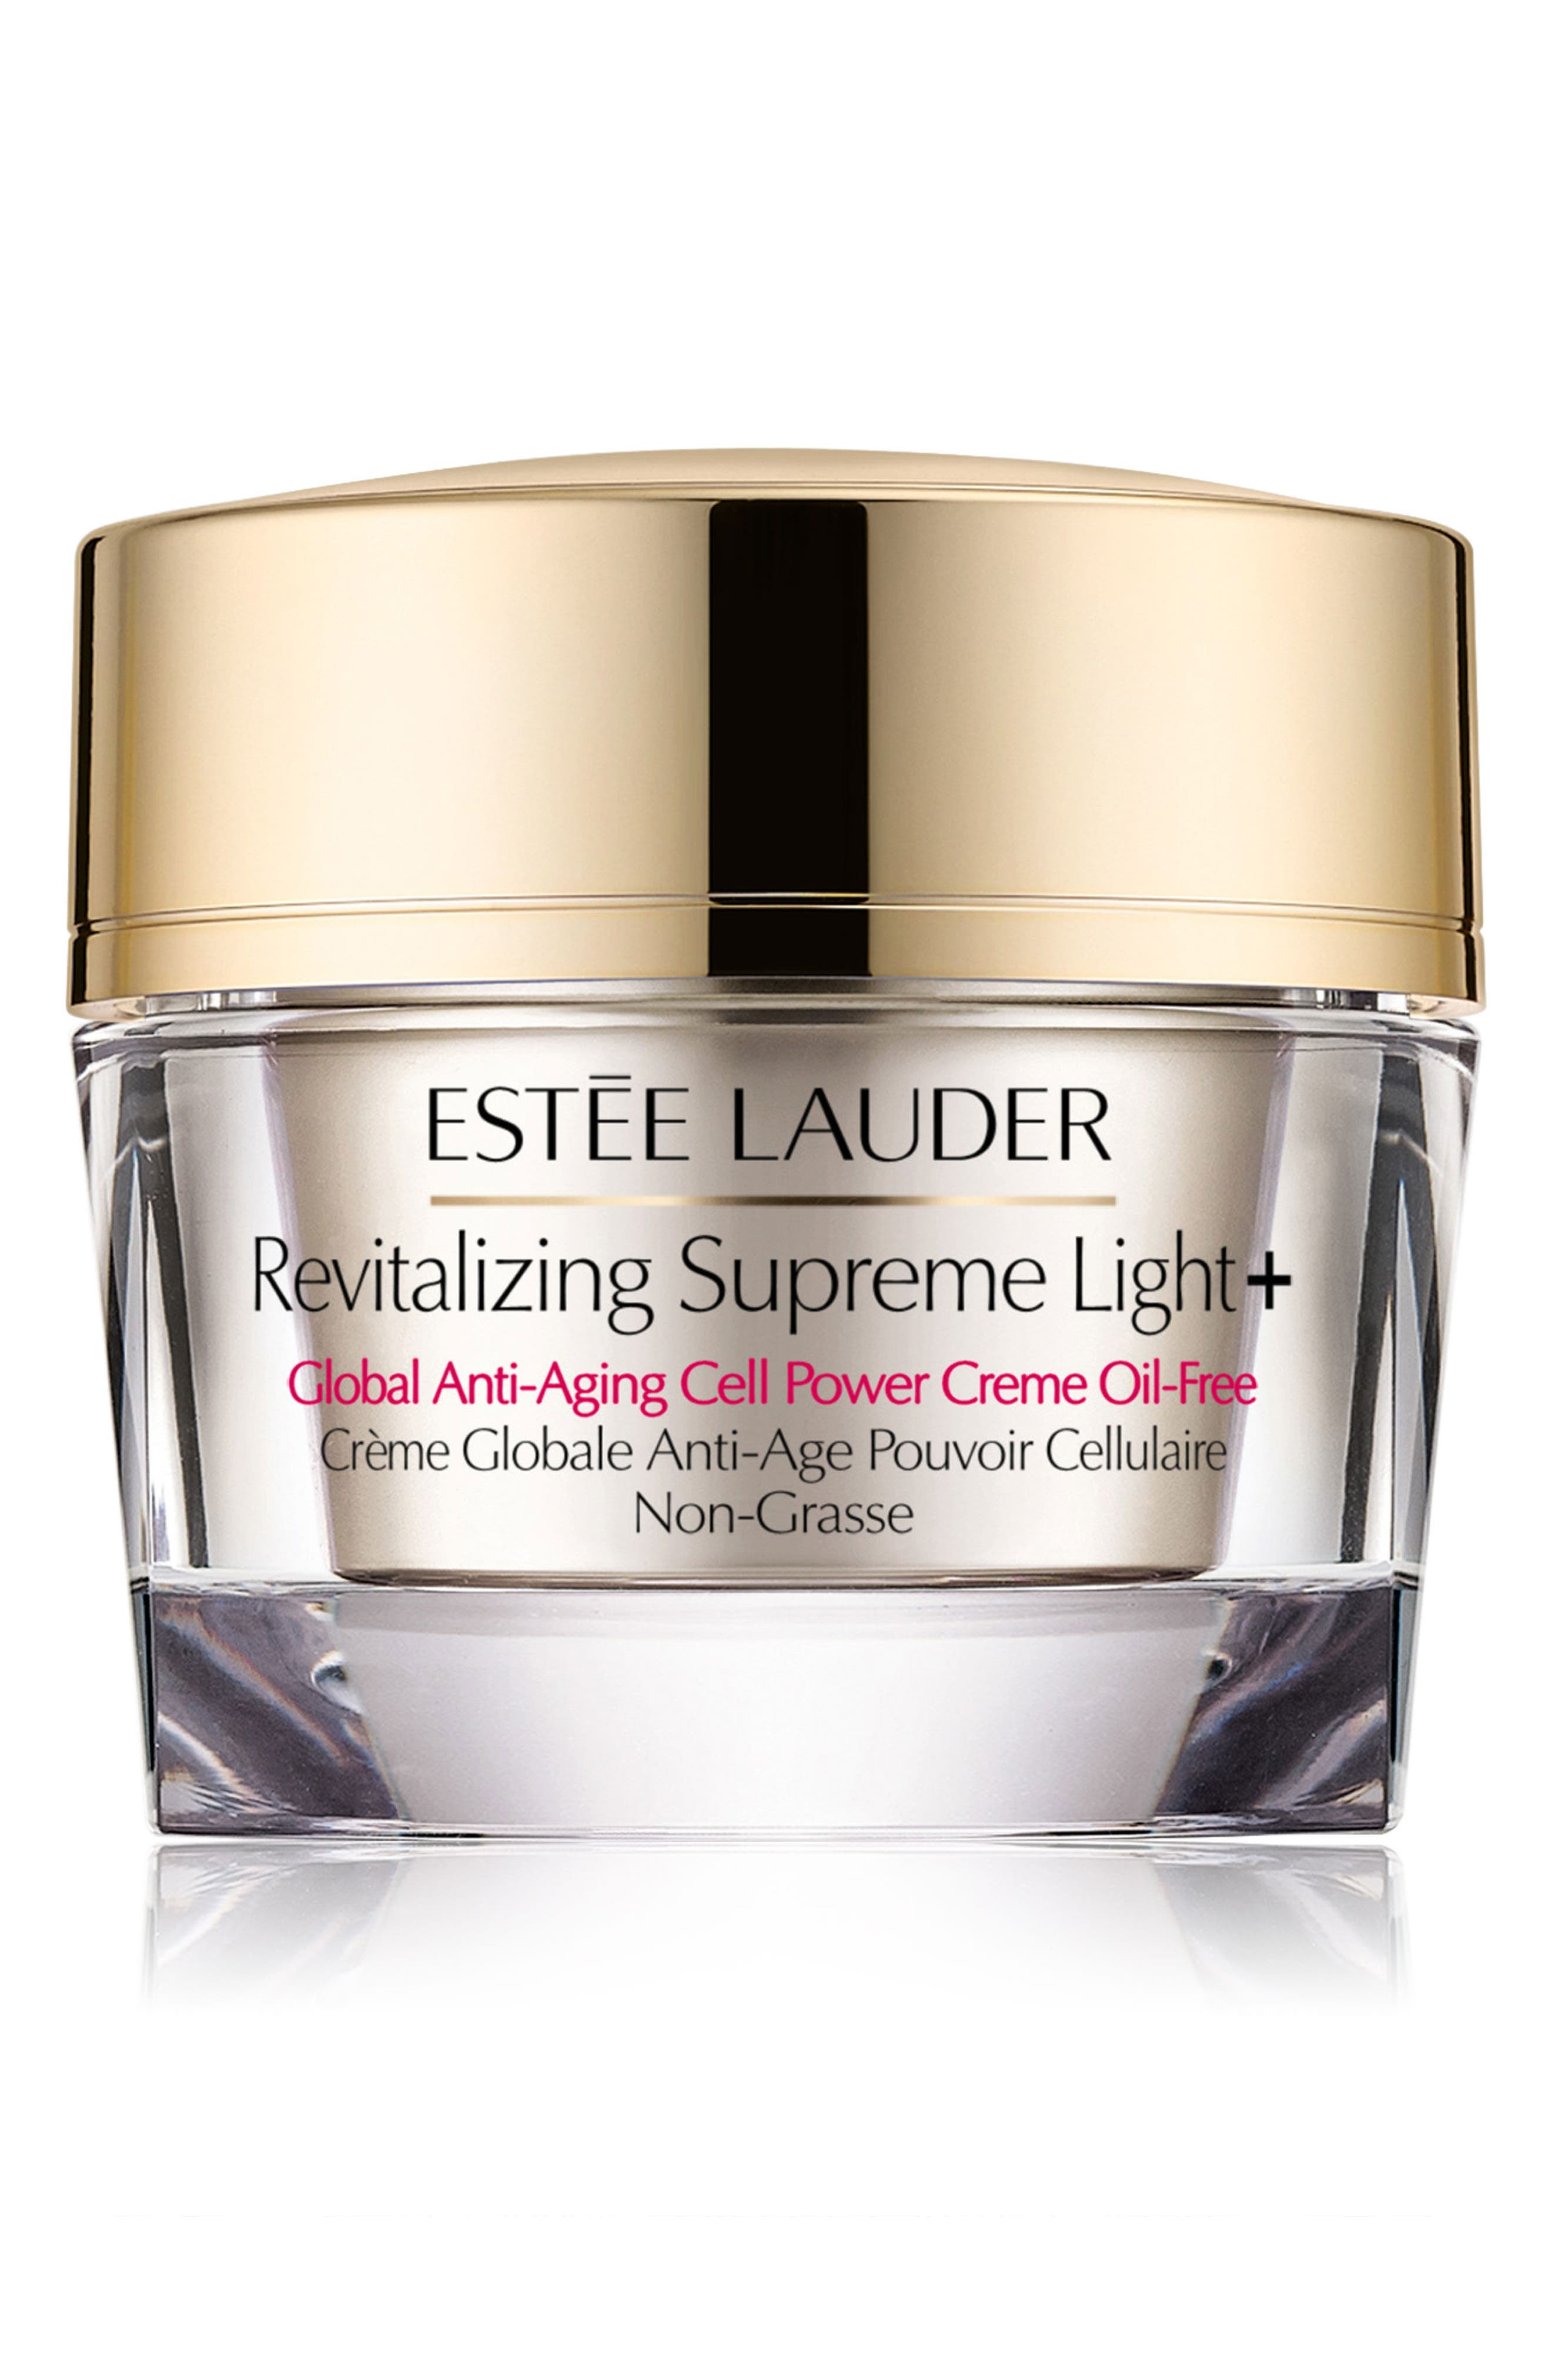 Revitalizing Supreme Light+ Global Anti-Aging Cell Power Creme Oil-Free,                             Main thumbnail 1, color,                             960